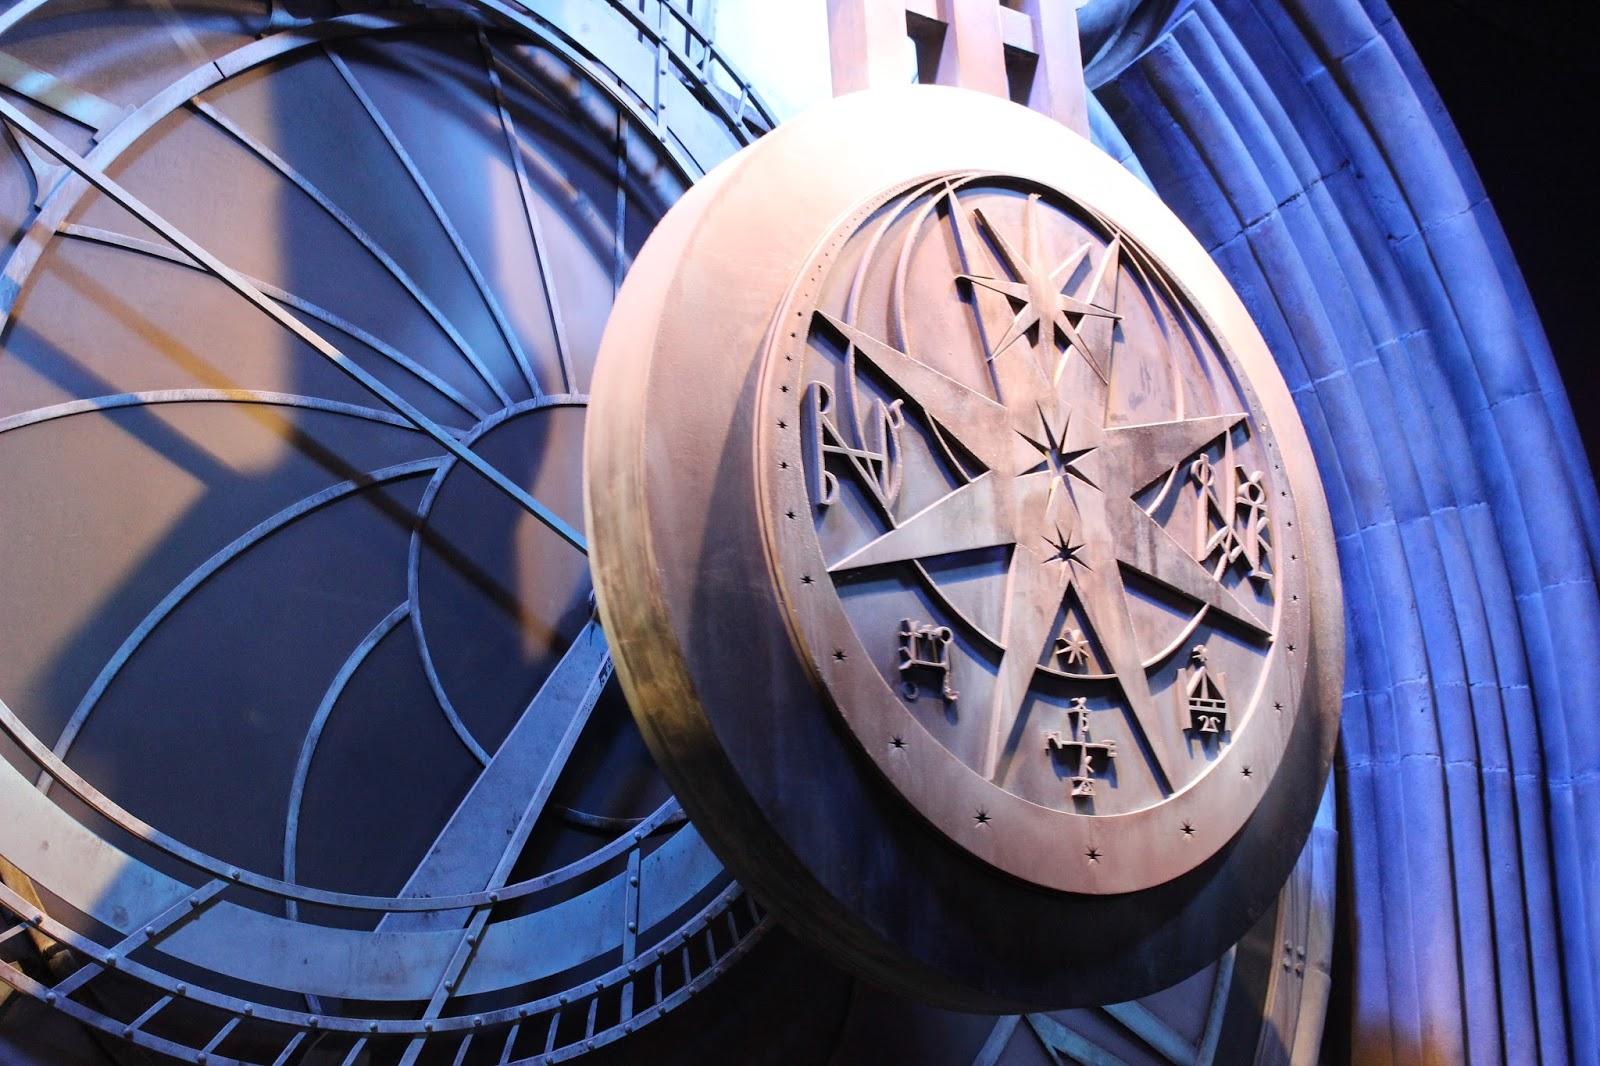 Harry Potter studio tour london clock